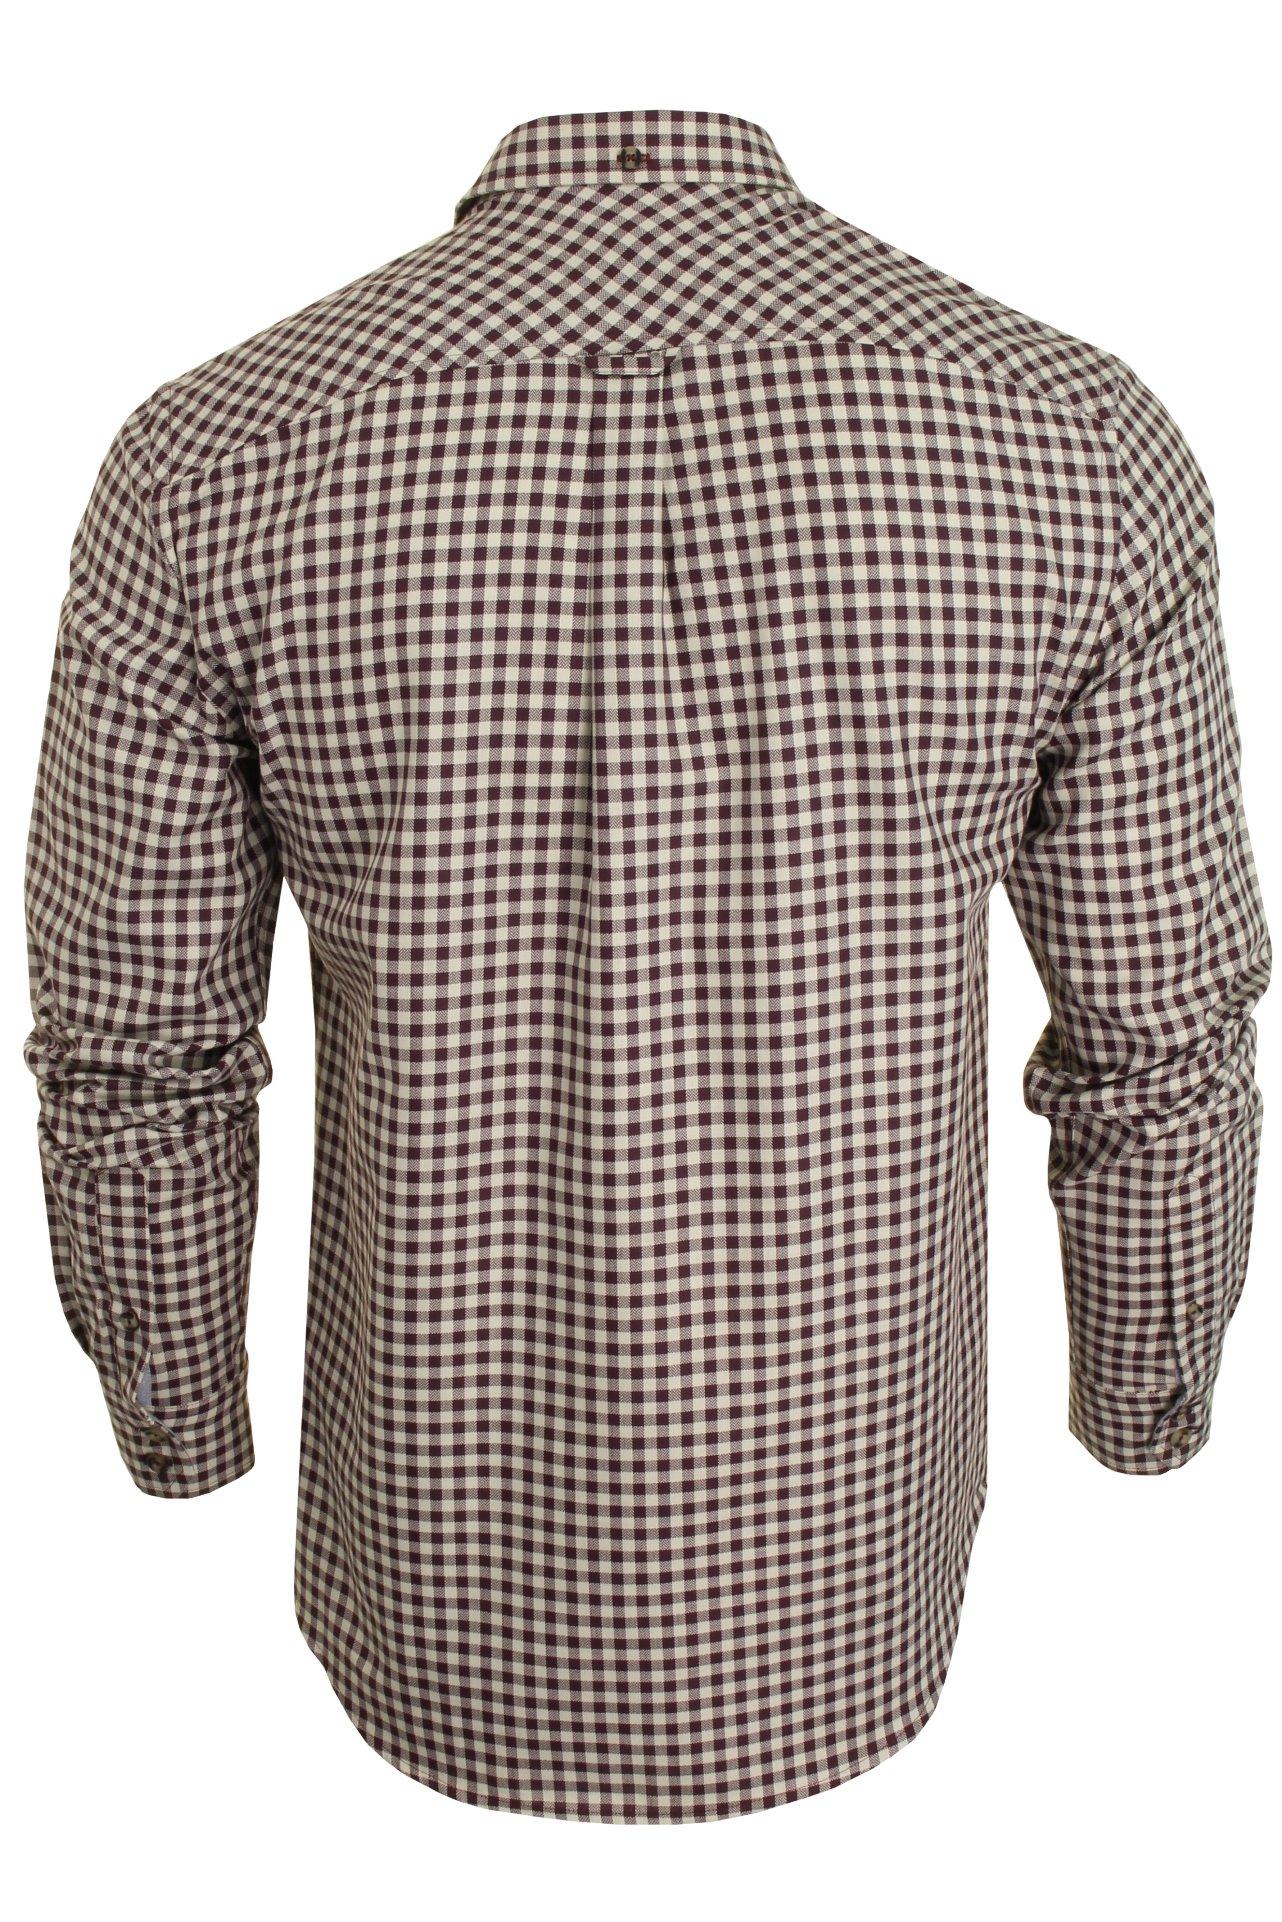 Mens-Ben-Sherman-Long-Sleeved-Shirt-Brushed-Gingham-Check thumbnail 8